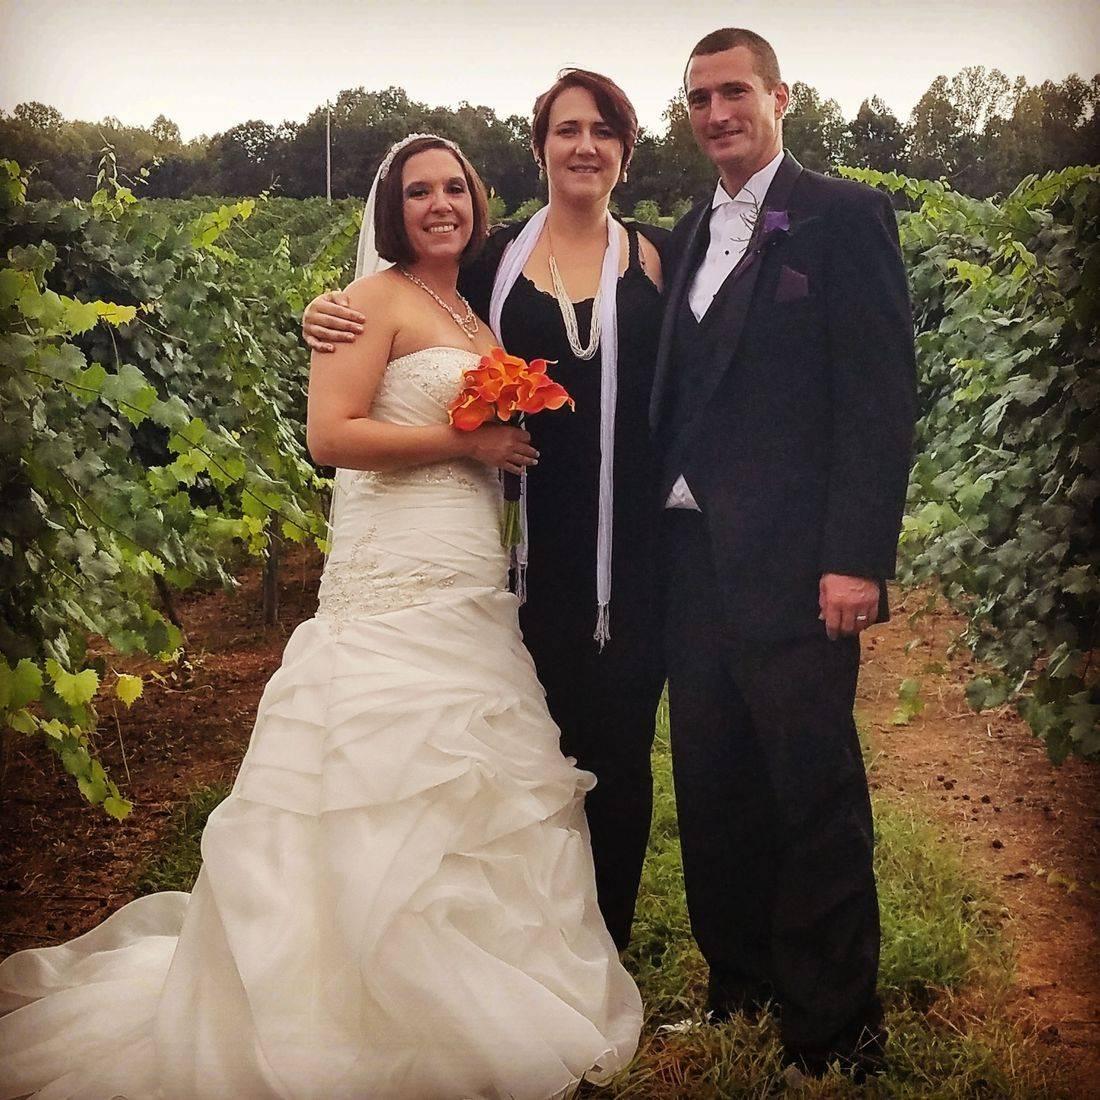 vineyard wedding, rural, outdoor, wine, wedding, celebrant, officiant, venue